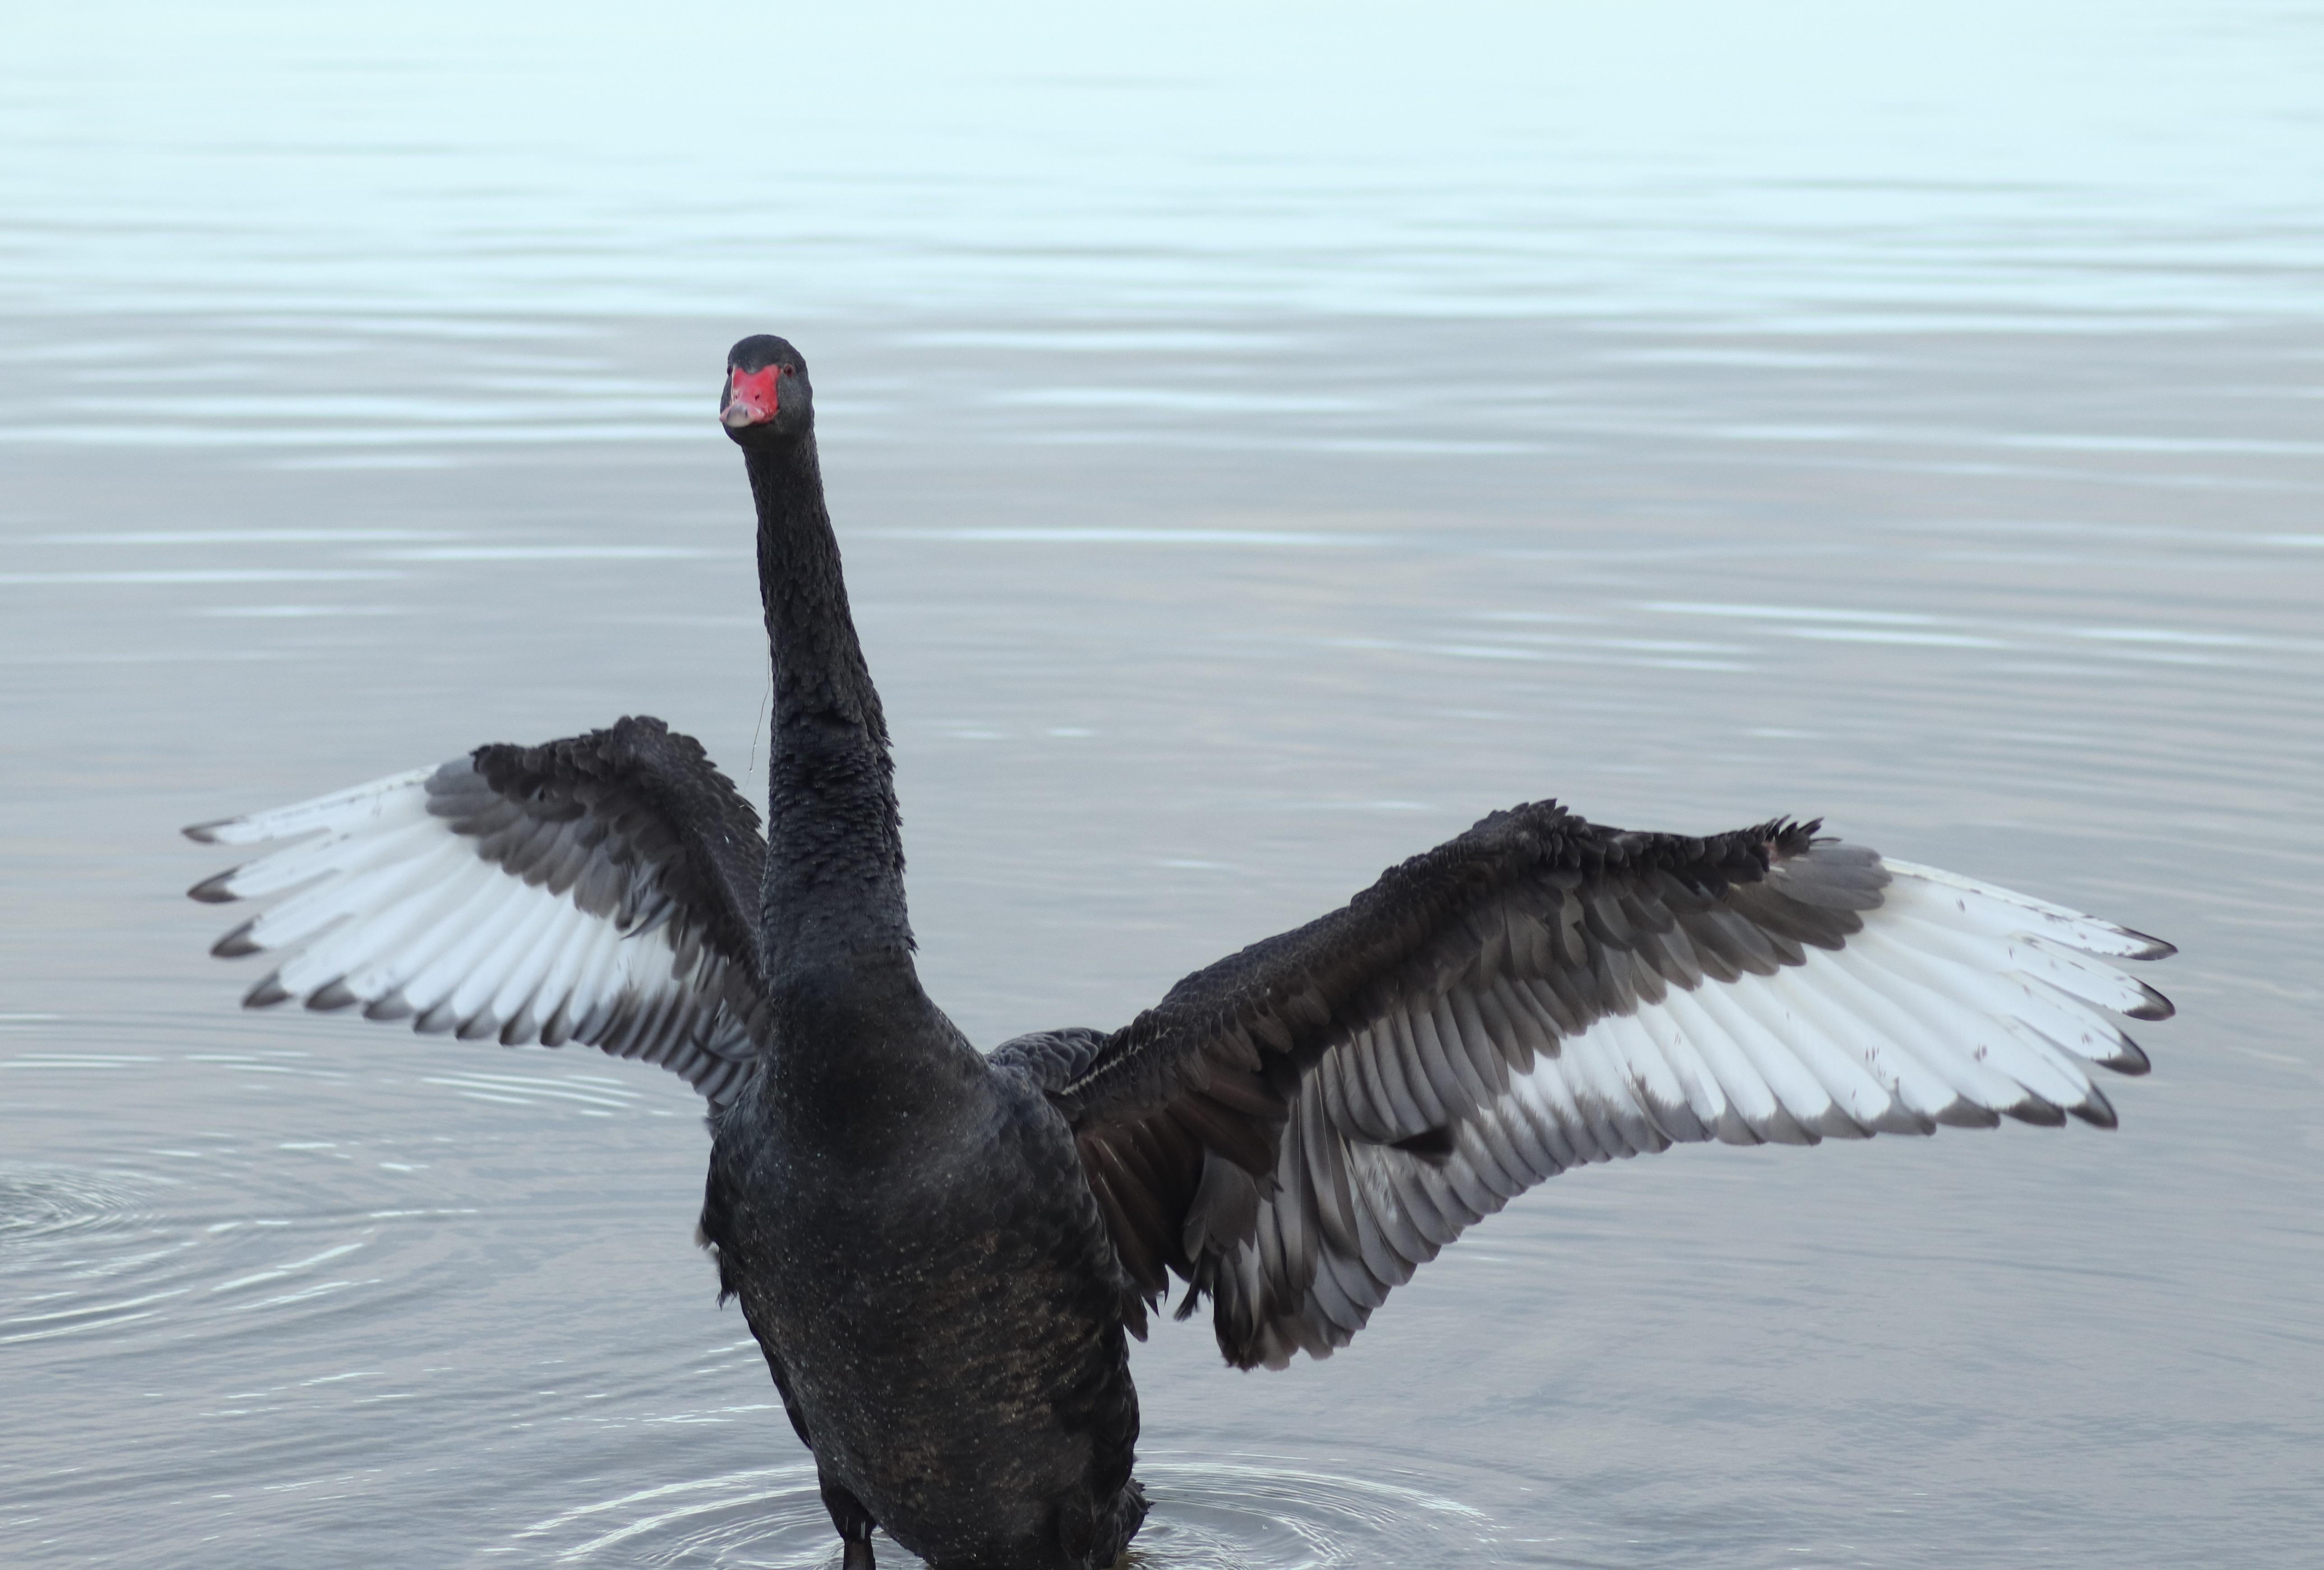 Black Swan Contact Lenses Scenes